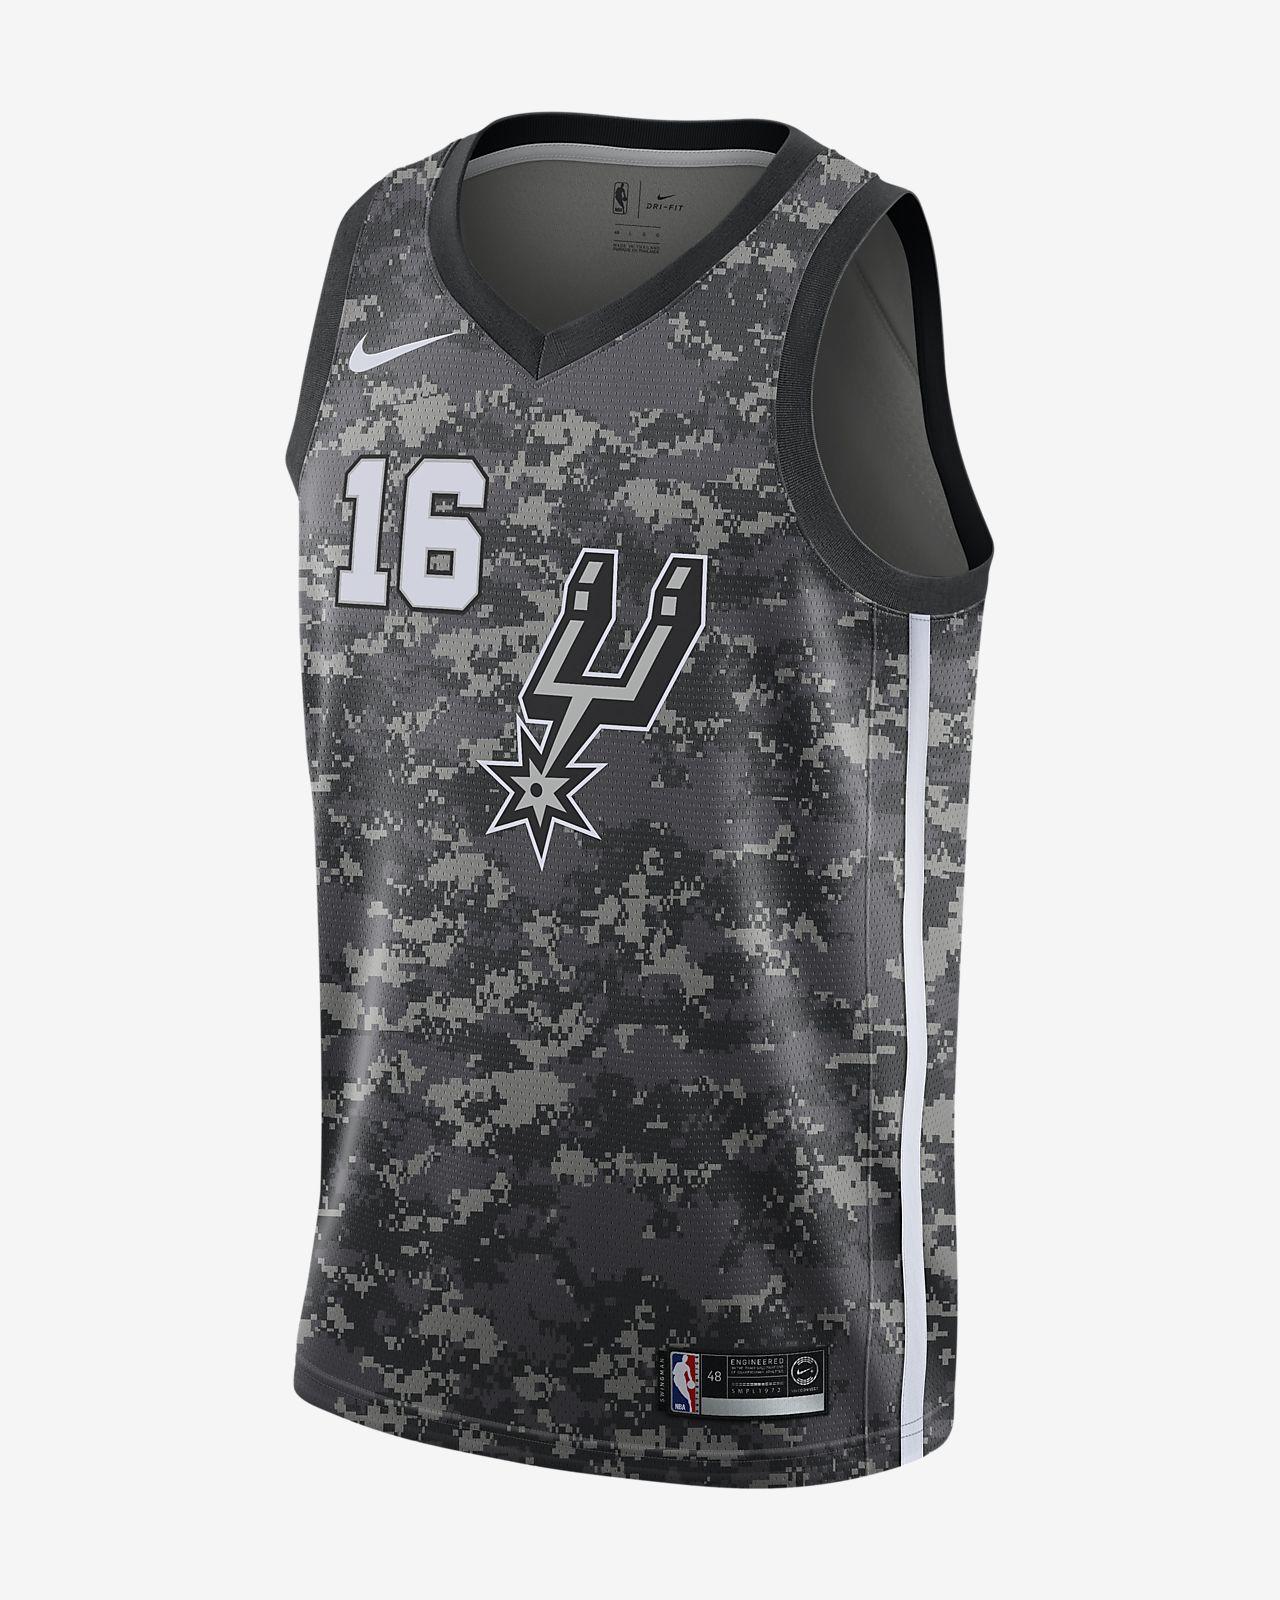 official photos 72121 2a627 Pau Gasol City Edition Swingman Jersey (San Antonio Spurs) Men's Nike NBA  Jersey